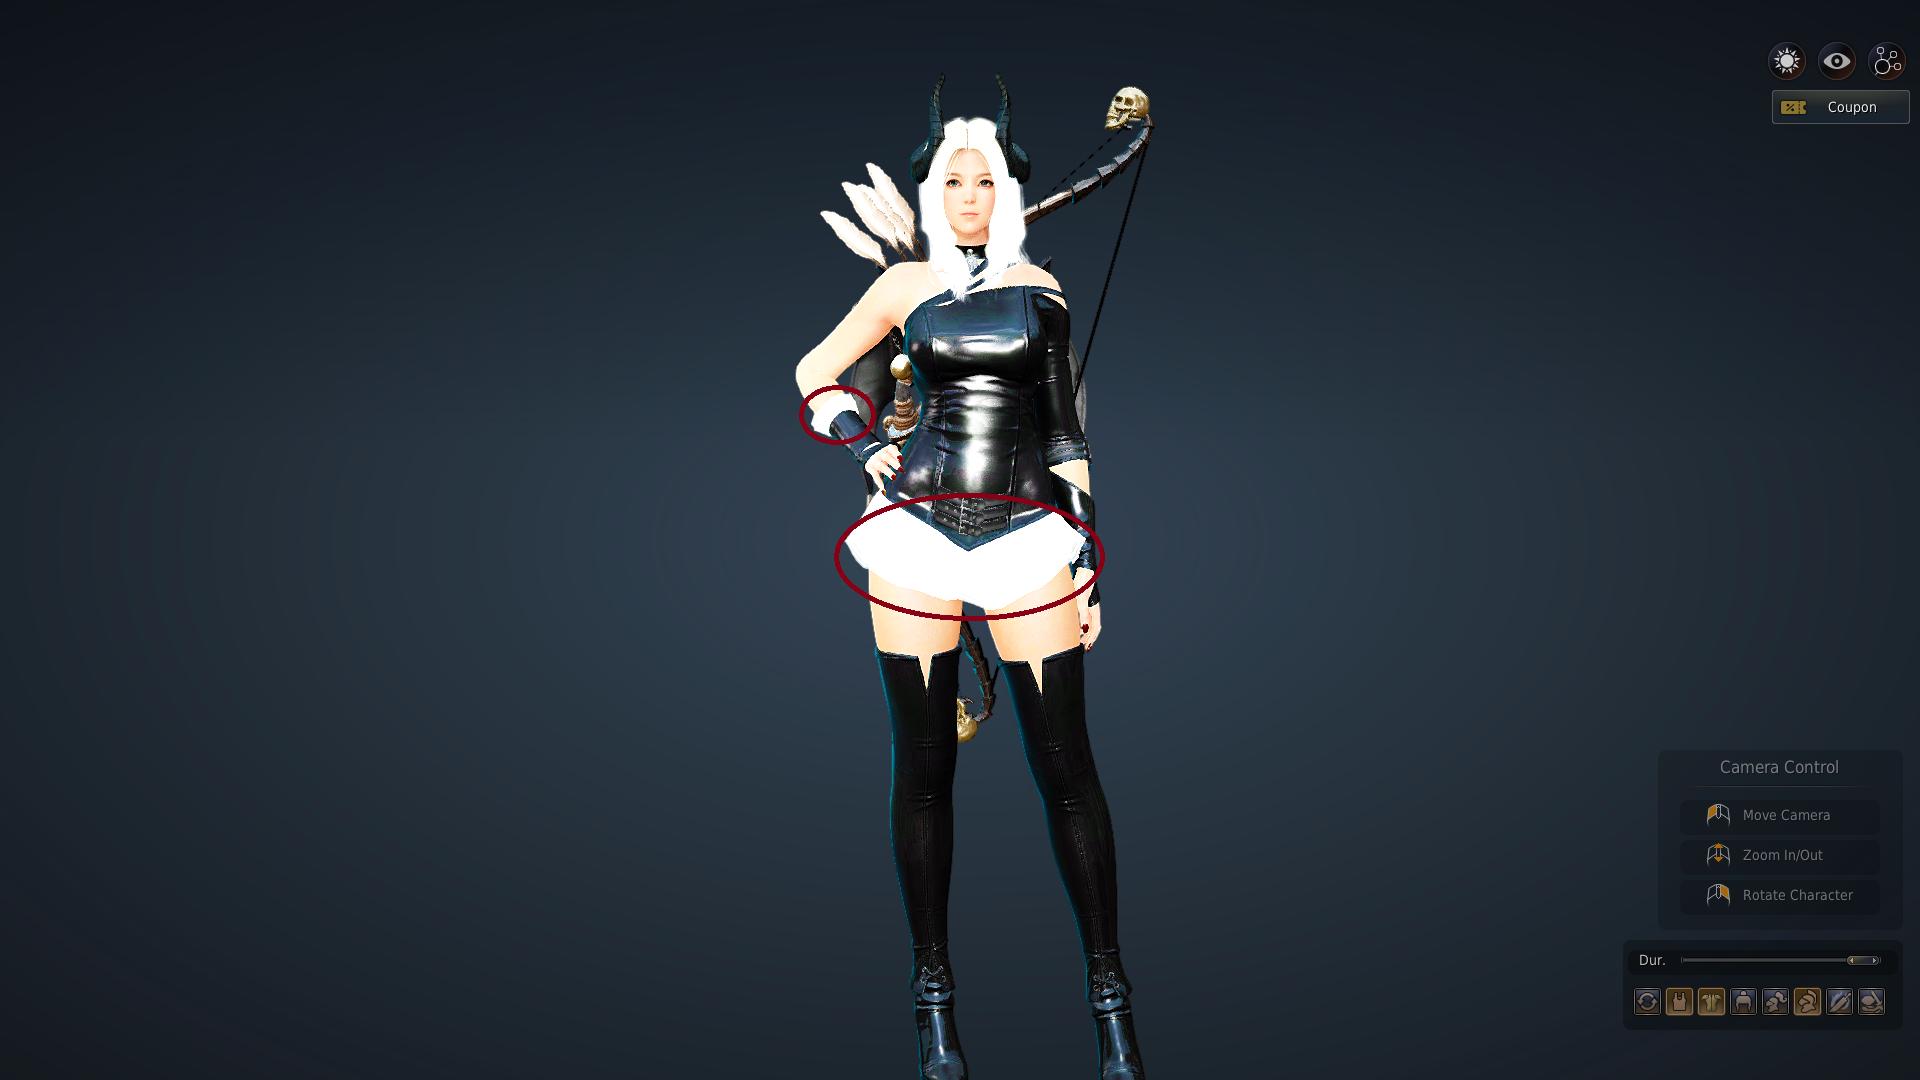 Black Desert Online -Nude body, Costume Mods for Meta